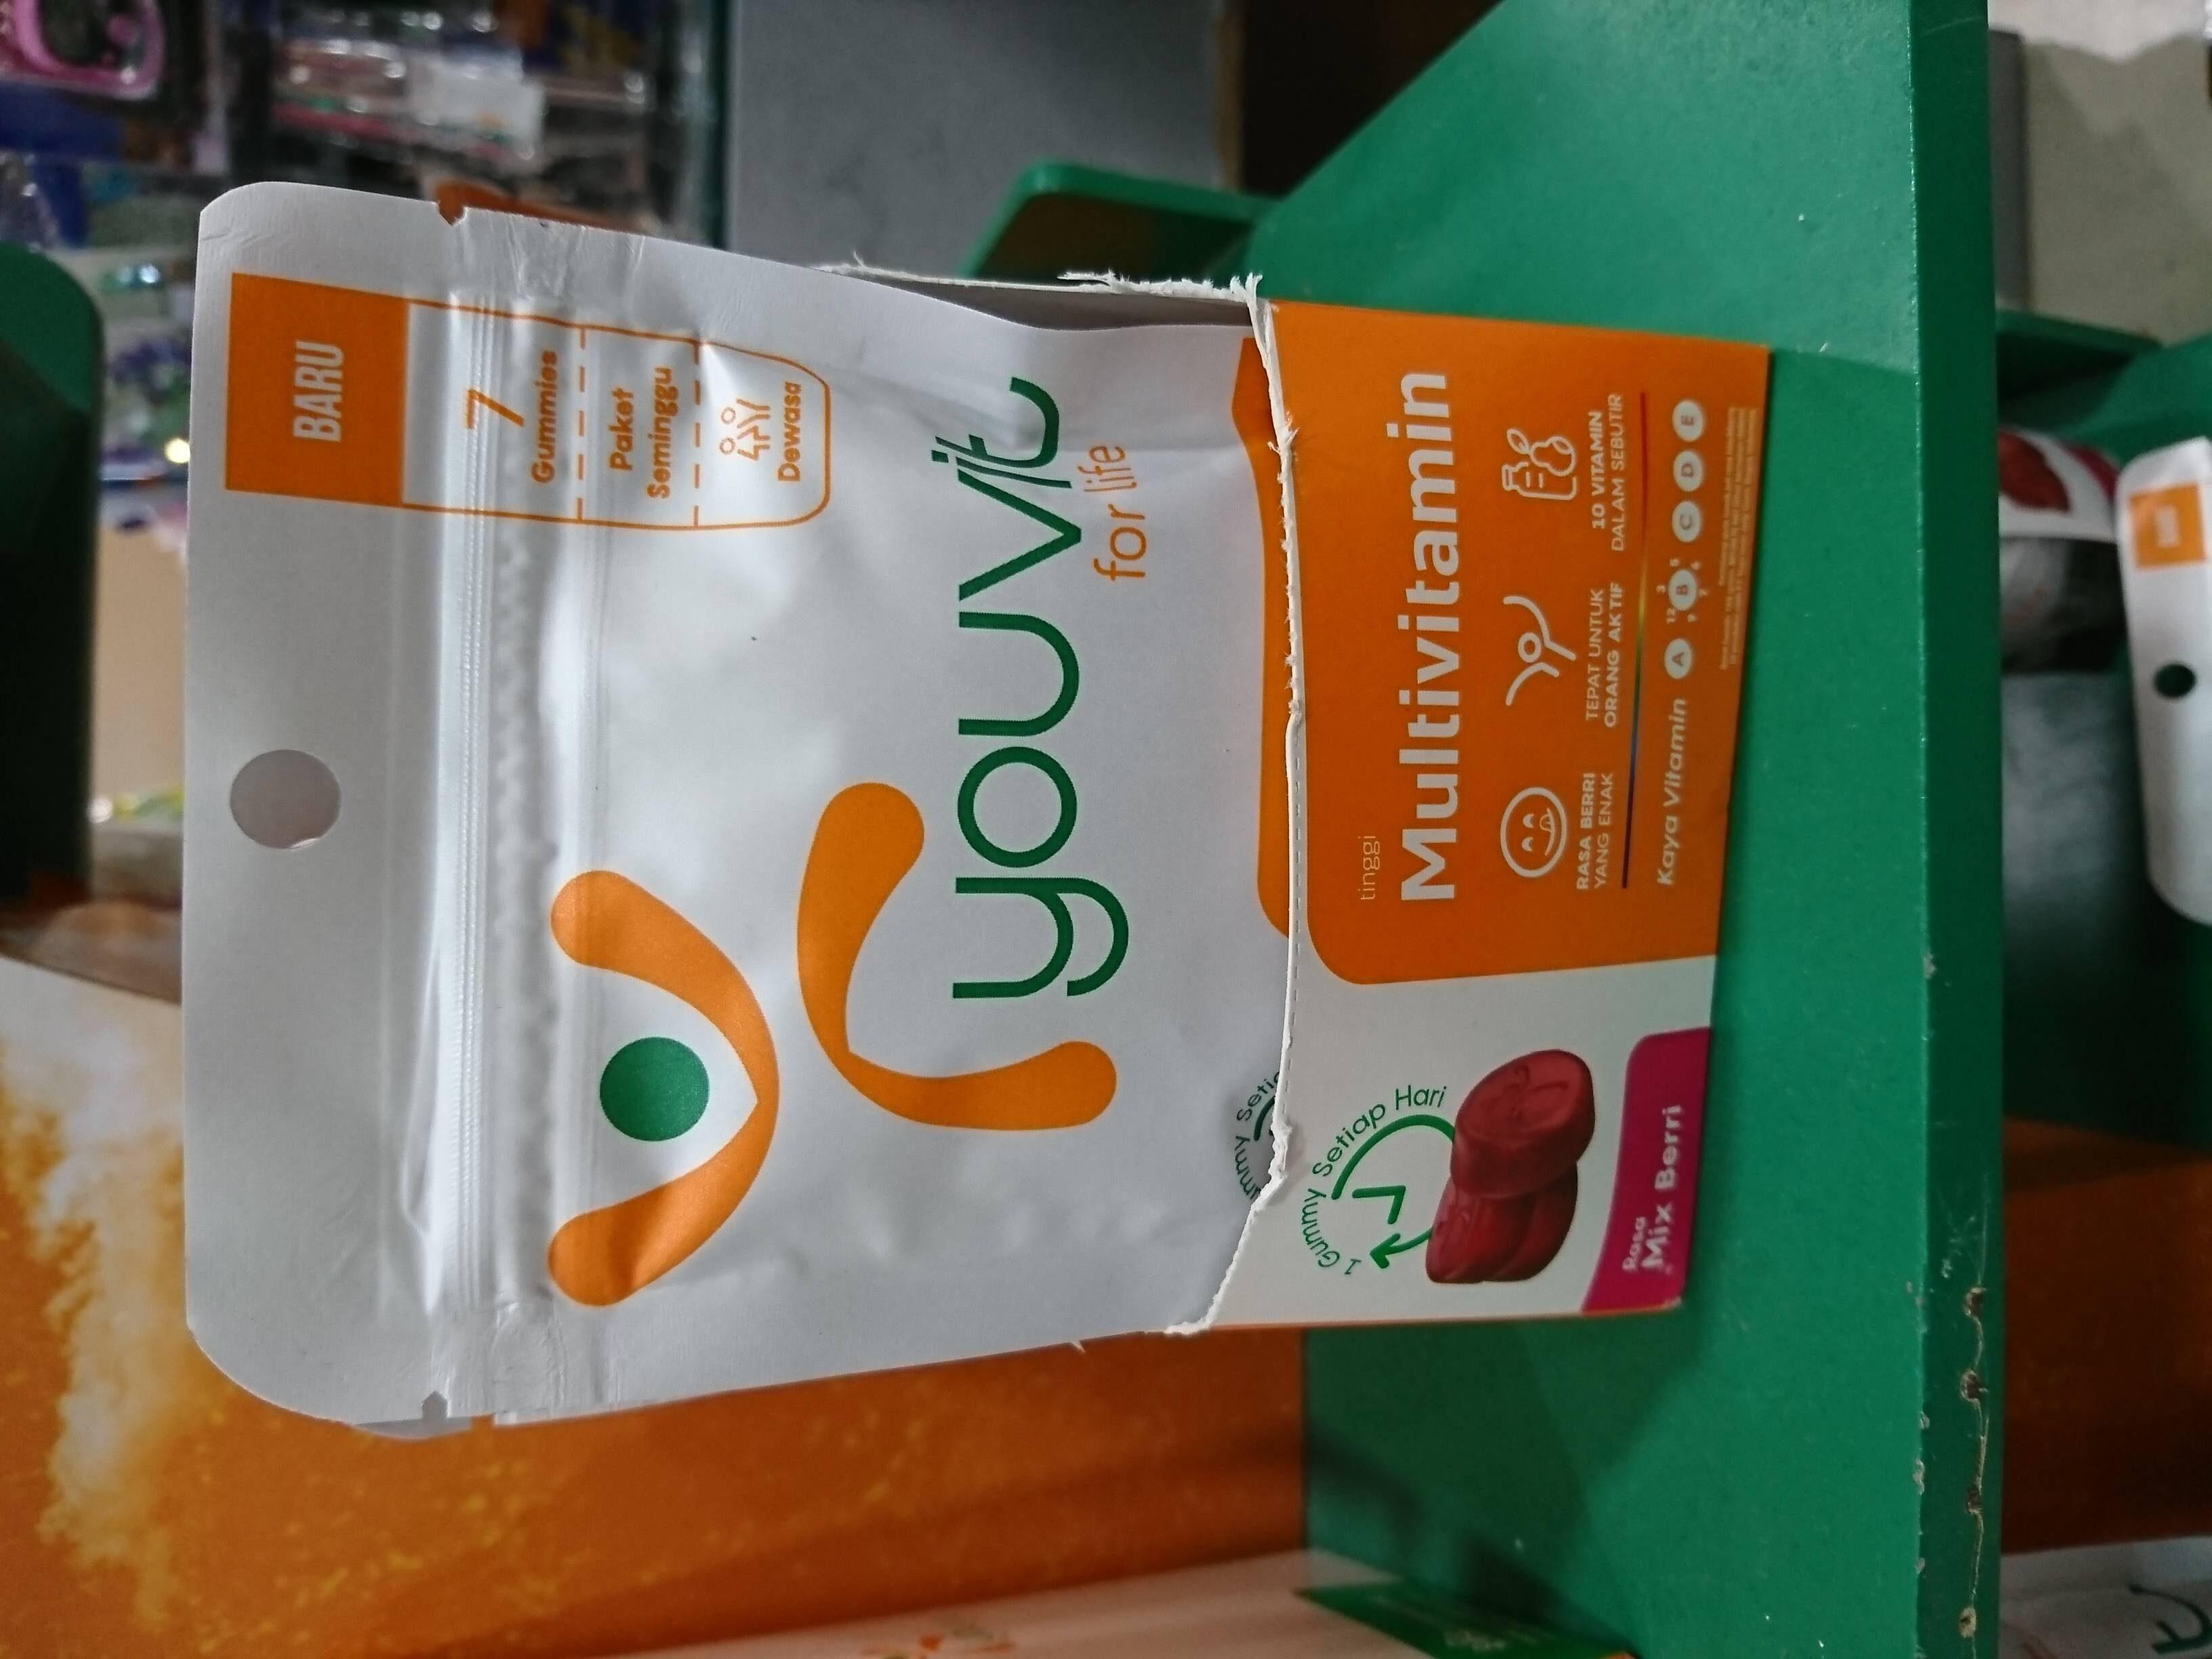 Youvit Multivitamin Gum Dewasa - Produk - en